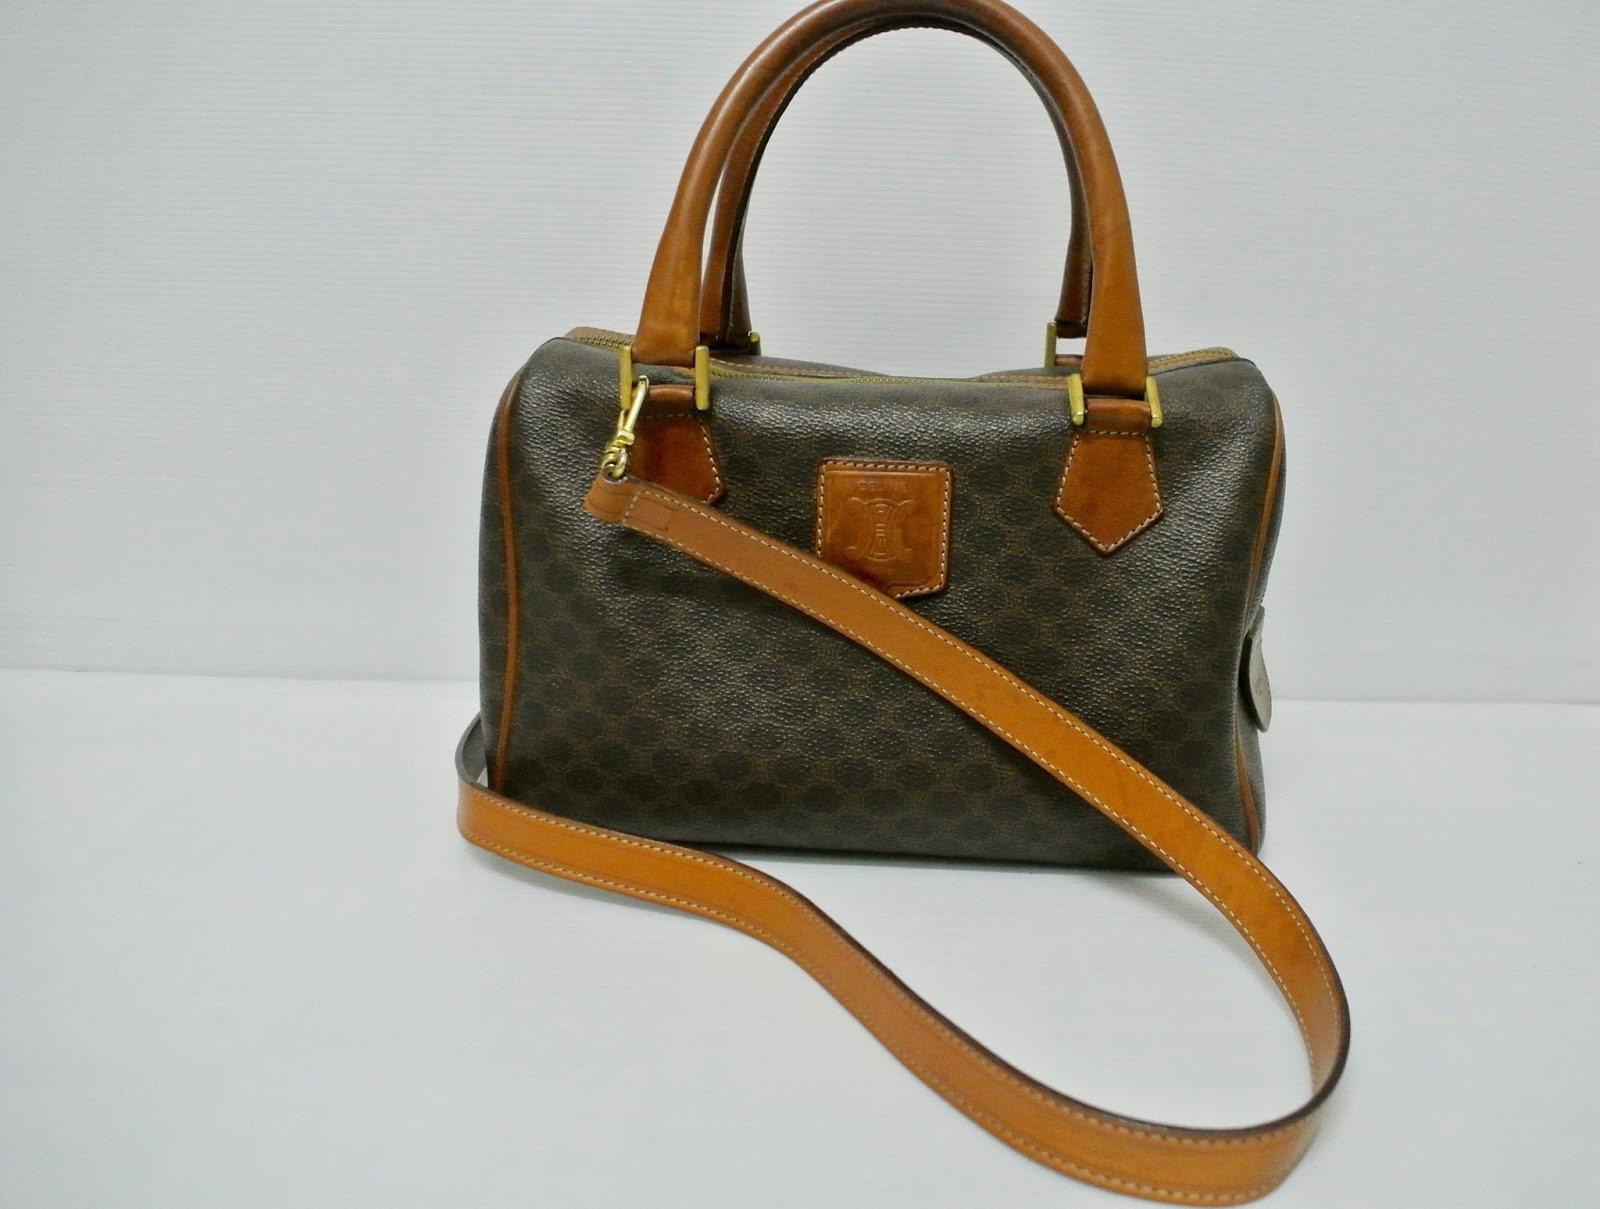 celine leather luggage tote - celine brown bag, celine bags sale online